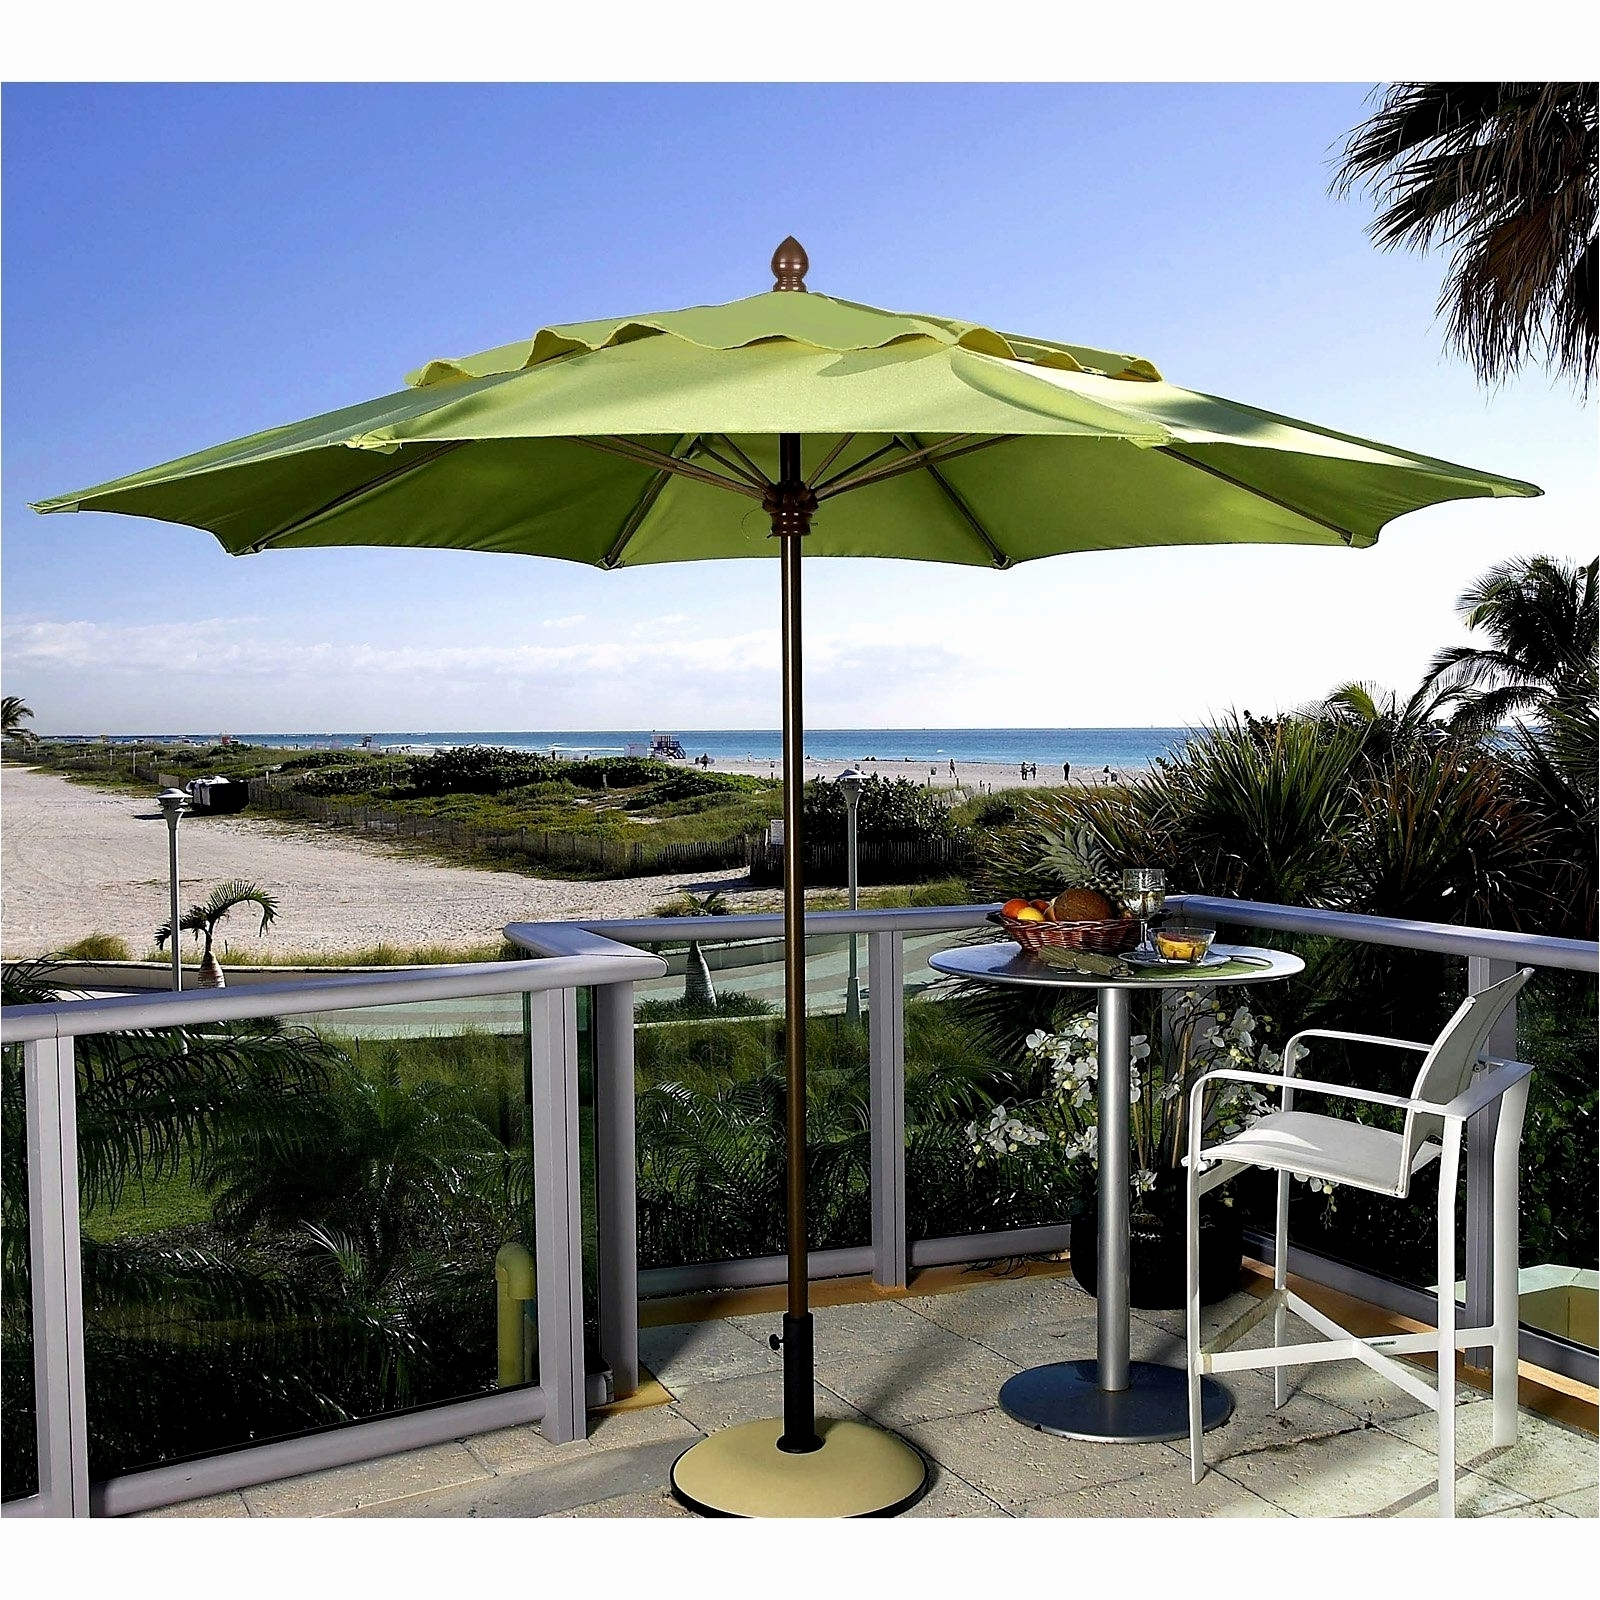 Lovely Ideas Outdoor Umbrella Costco Ikea Patio Umbrella – Best Regarding Most Up To Date Patio Umbrellas At Costco (Gallery 10 of 20)